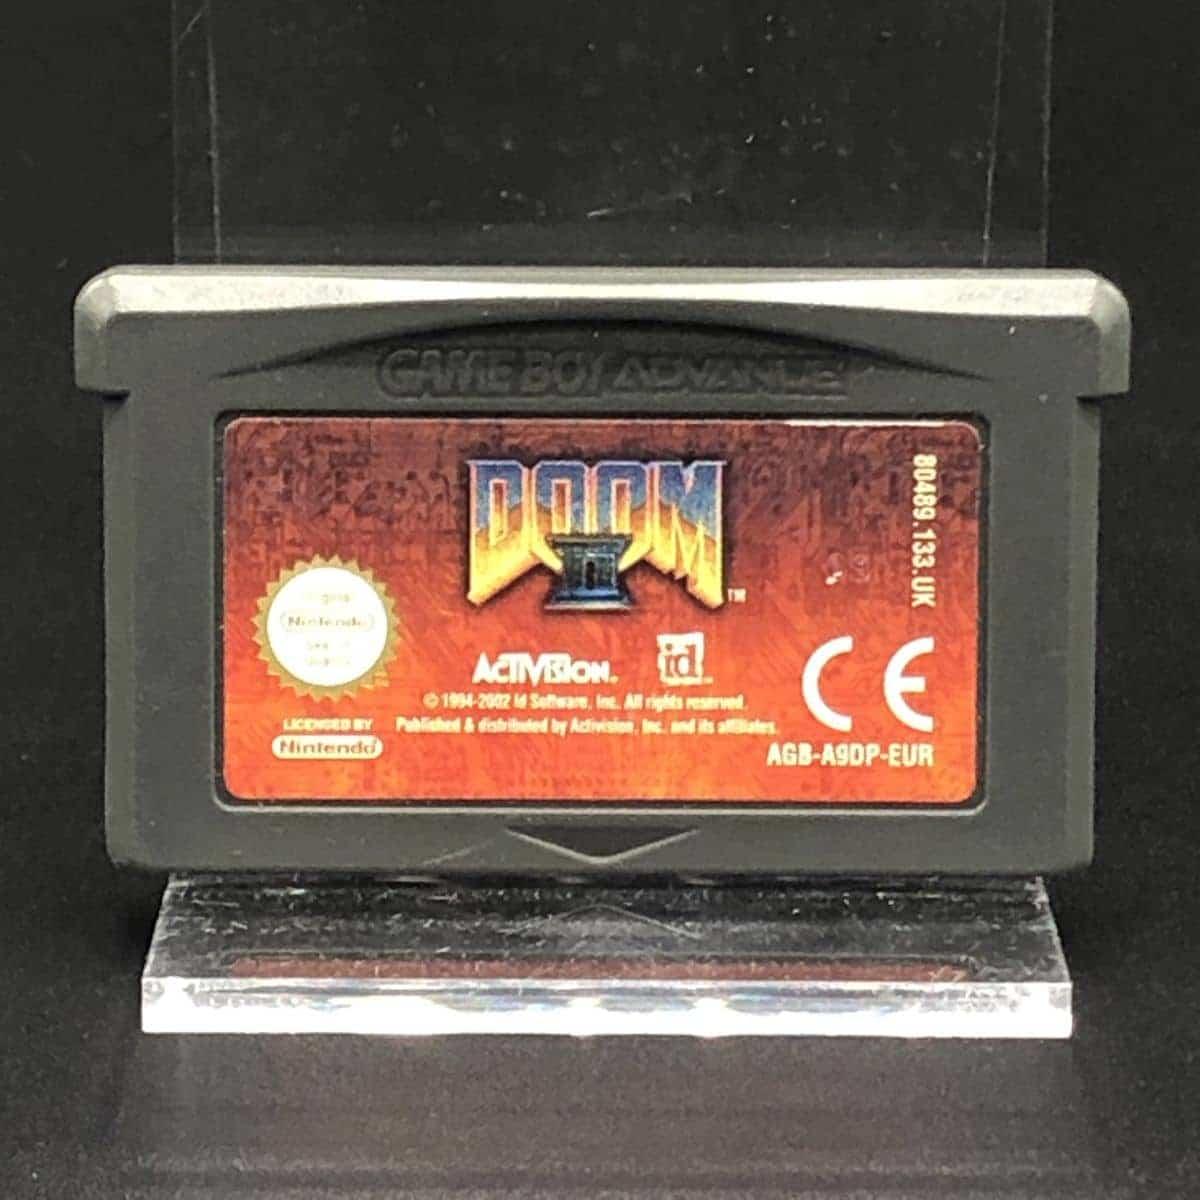 GBA Doom II: Hell on Earth (Modul) (Gut) Game Boy Advance